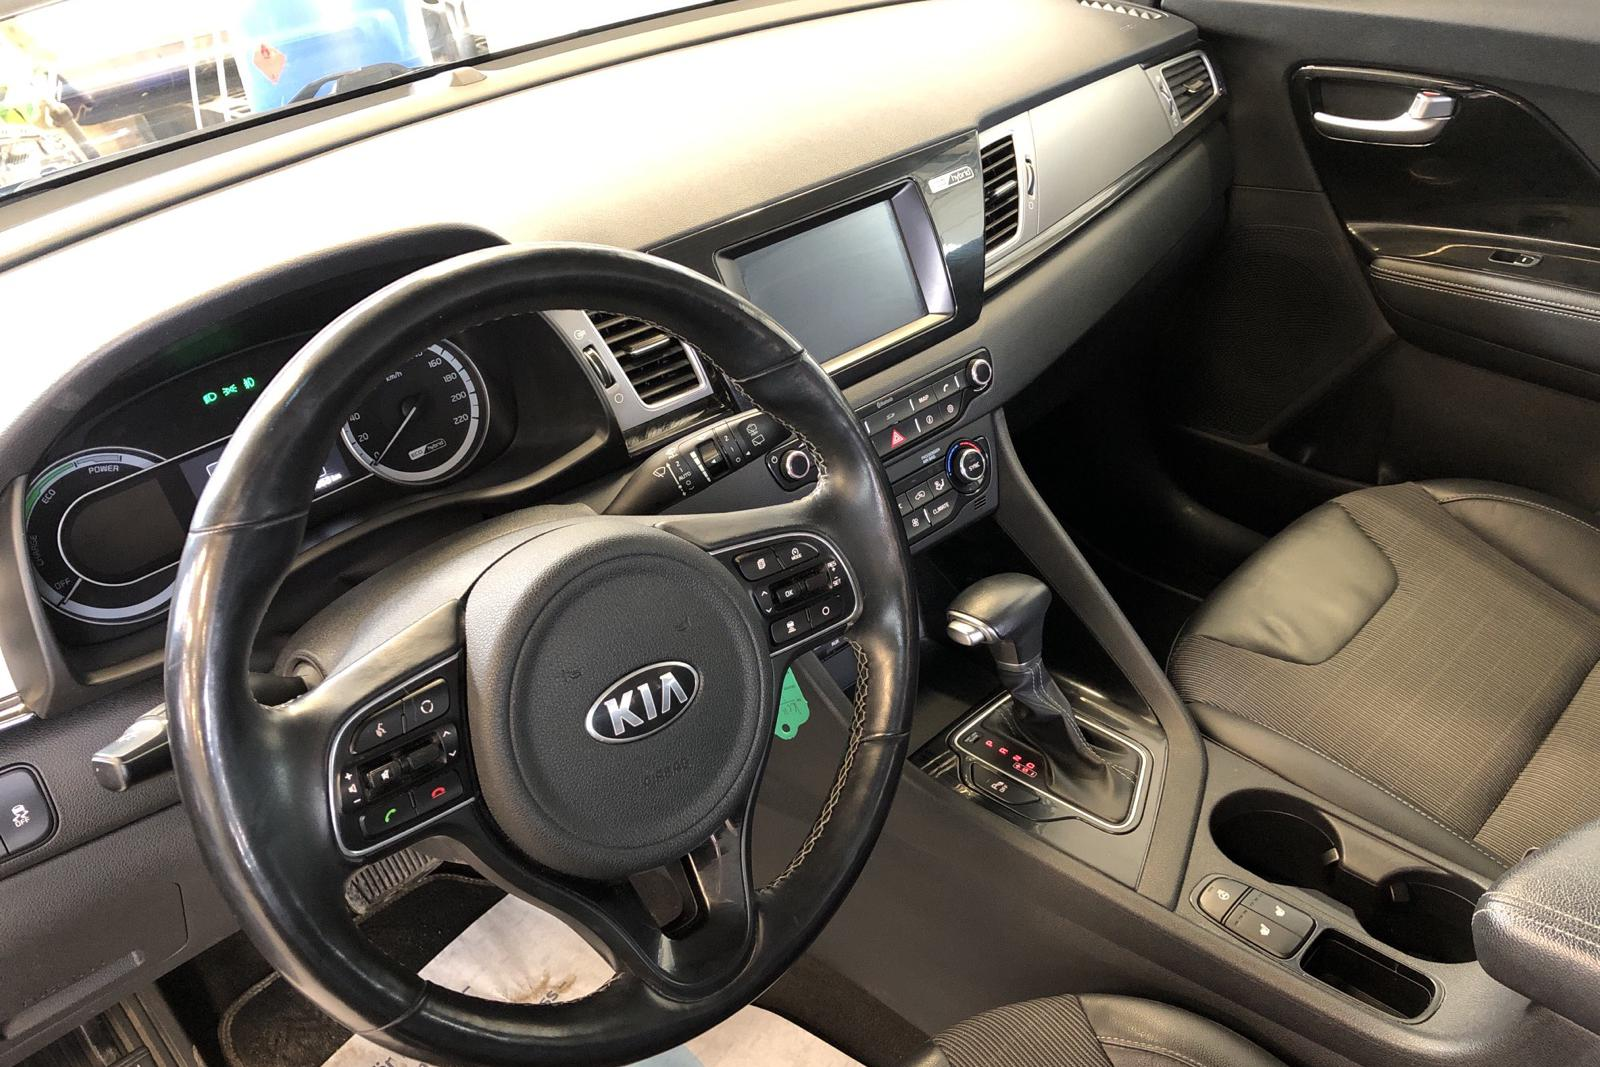 KIA Niro Hybrid 1.6 (141hk) - 80 850 km - Automatic - gray - 2017